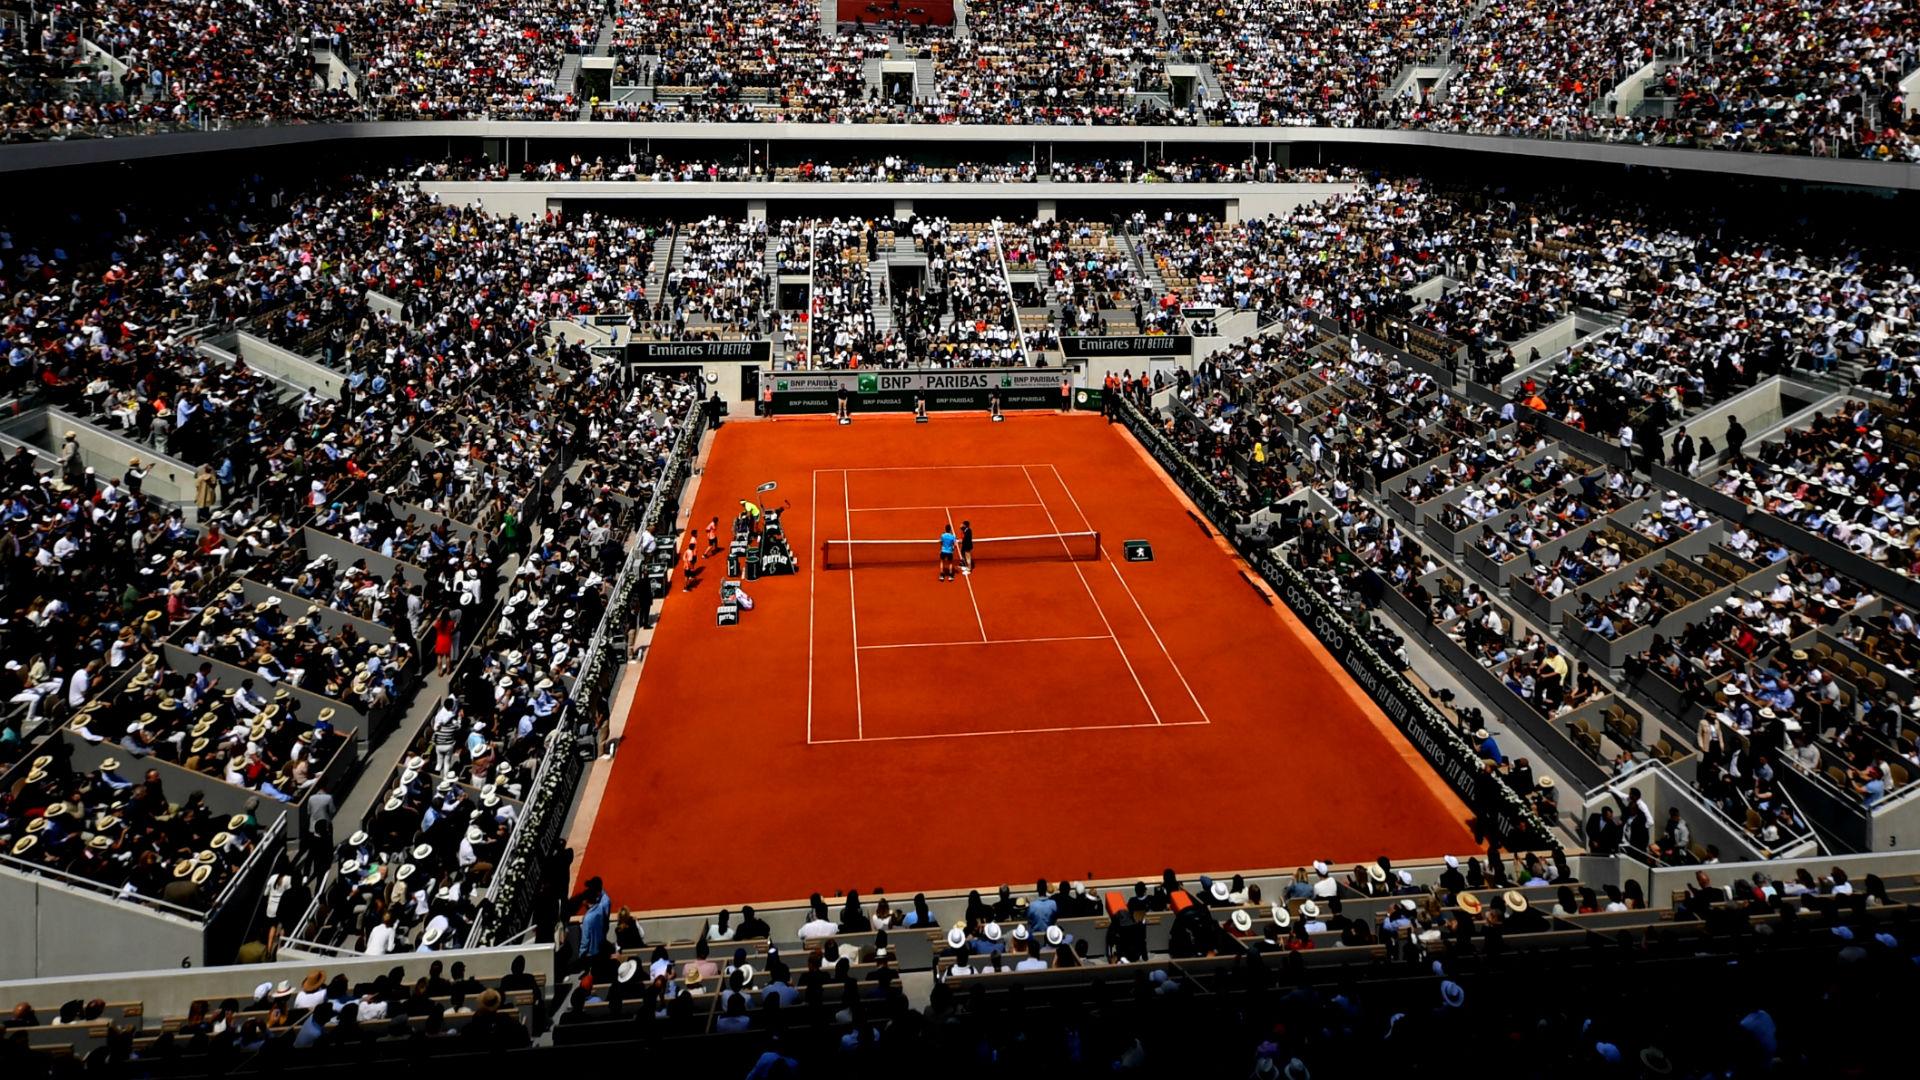 www.tennismajors.com